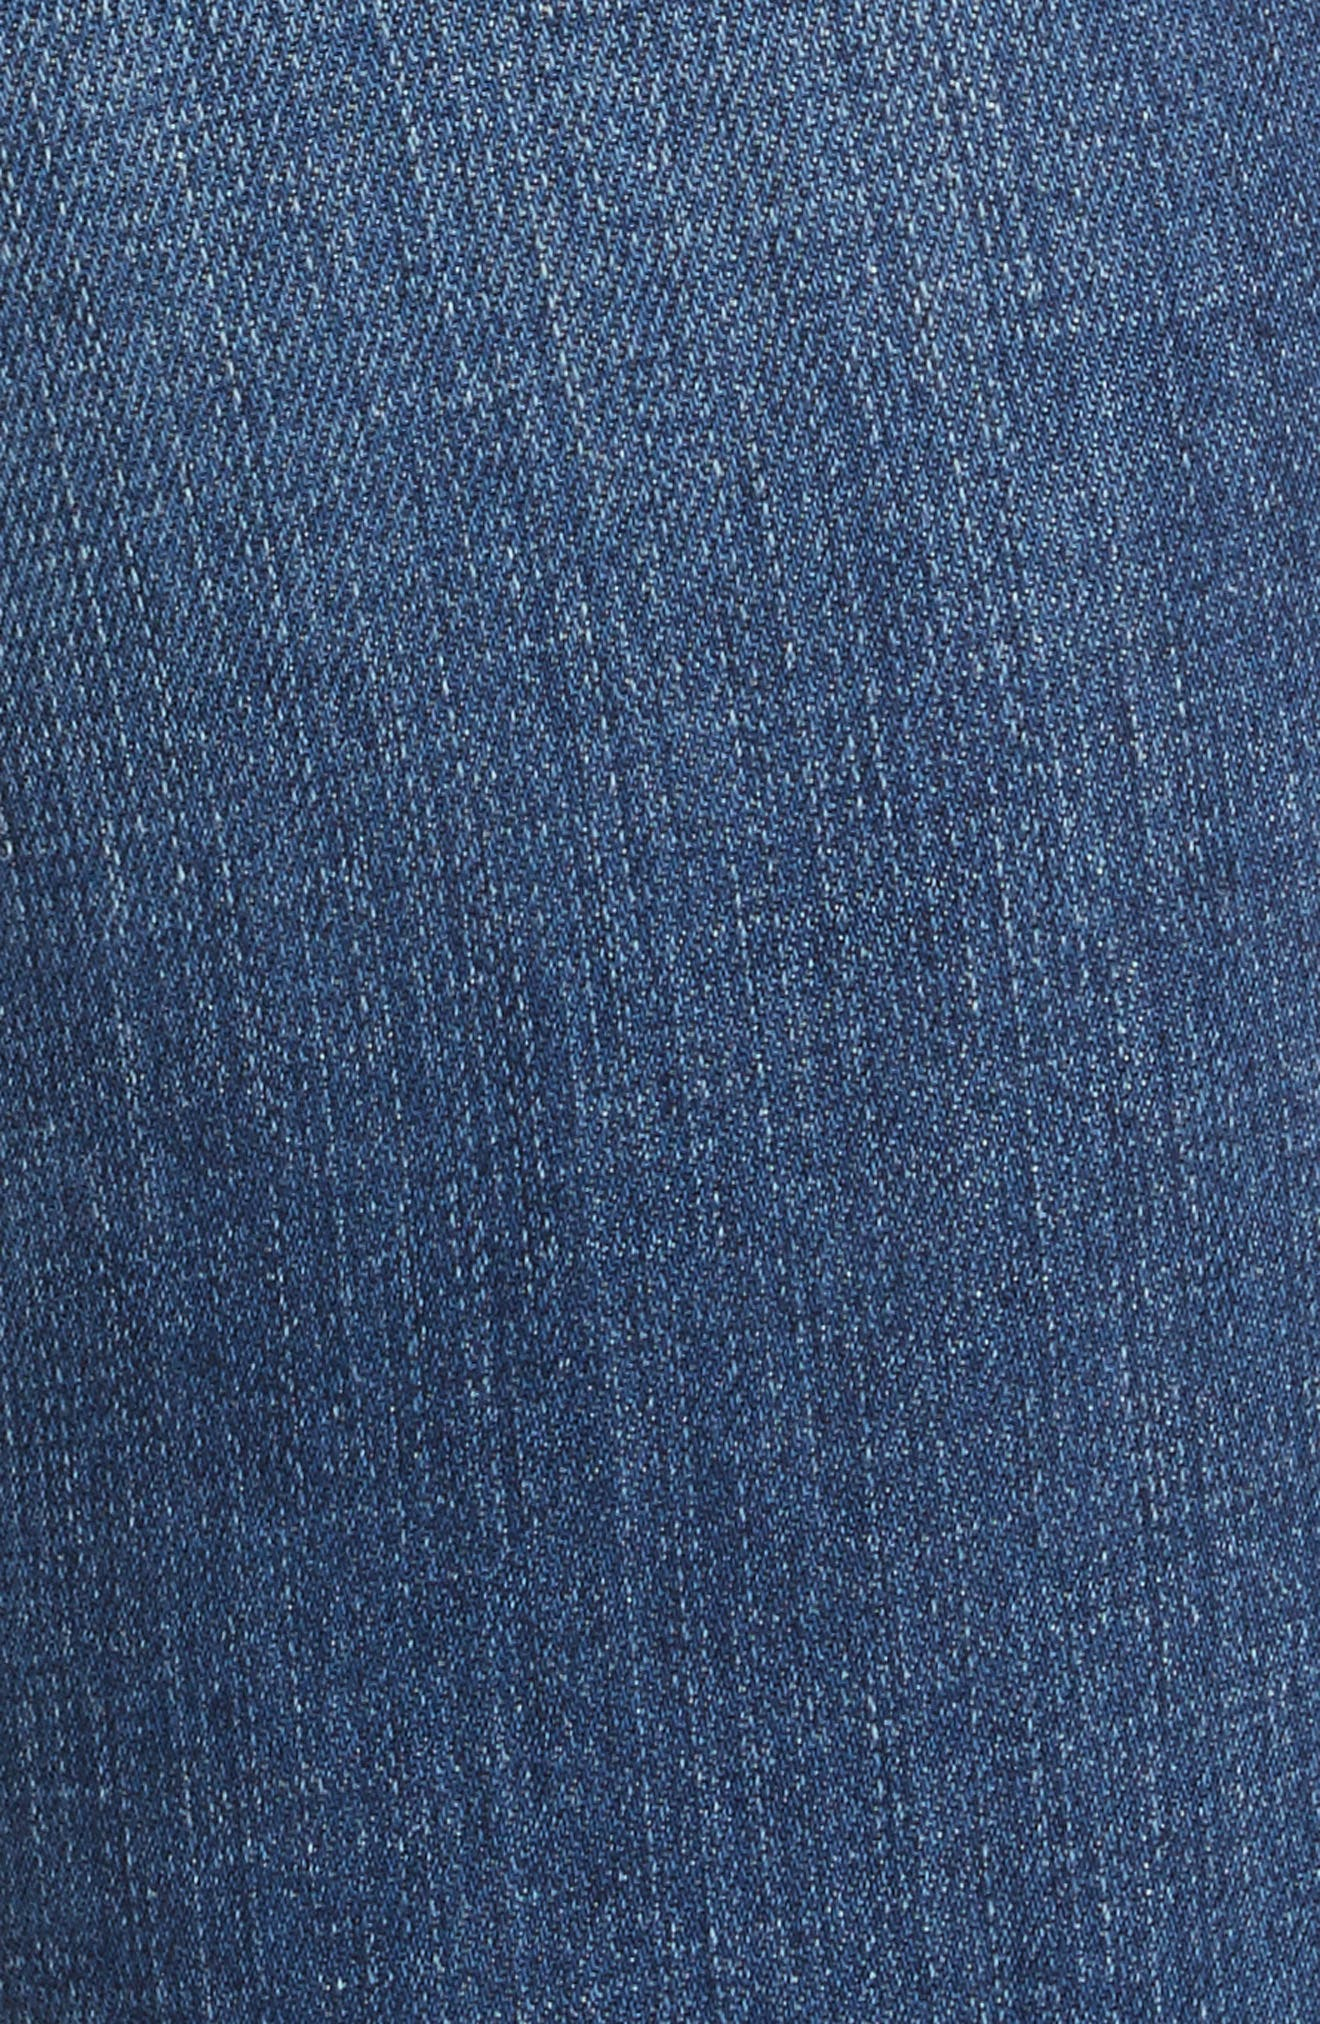 Laguna French High Waist Release Hem Jeans,                             Alternate thumbnail 5, color,                             Indigo